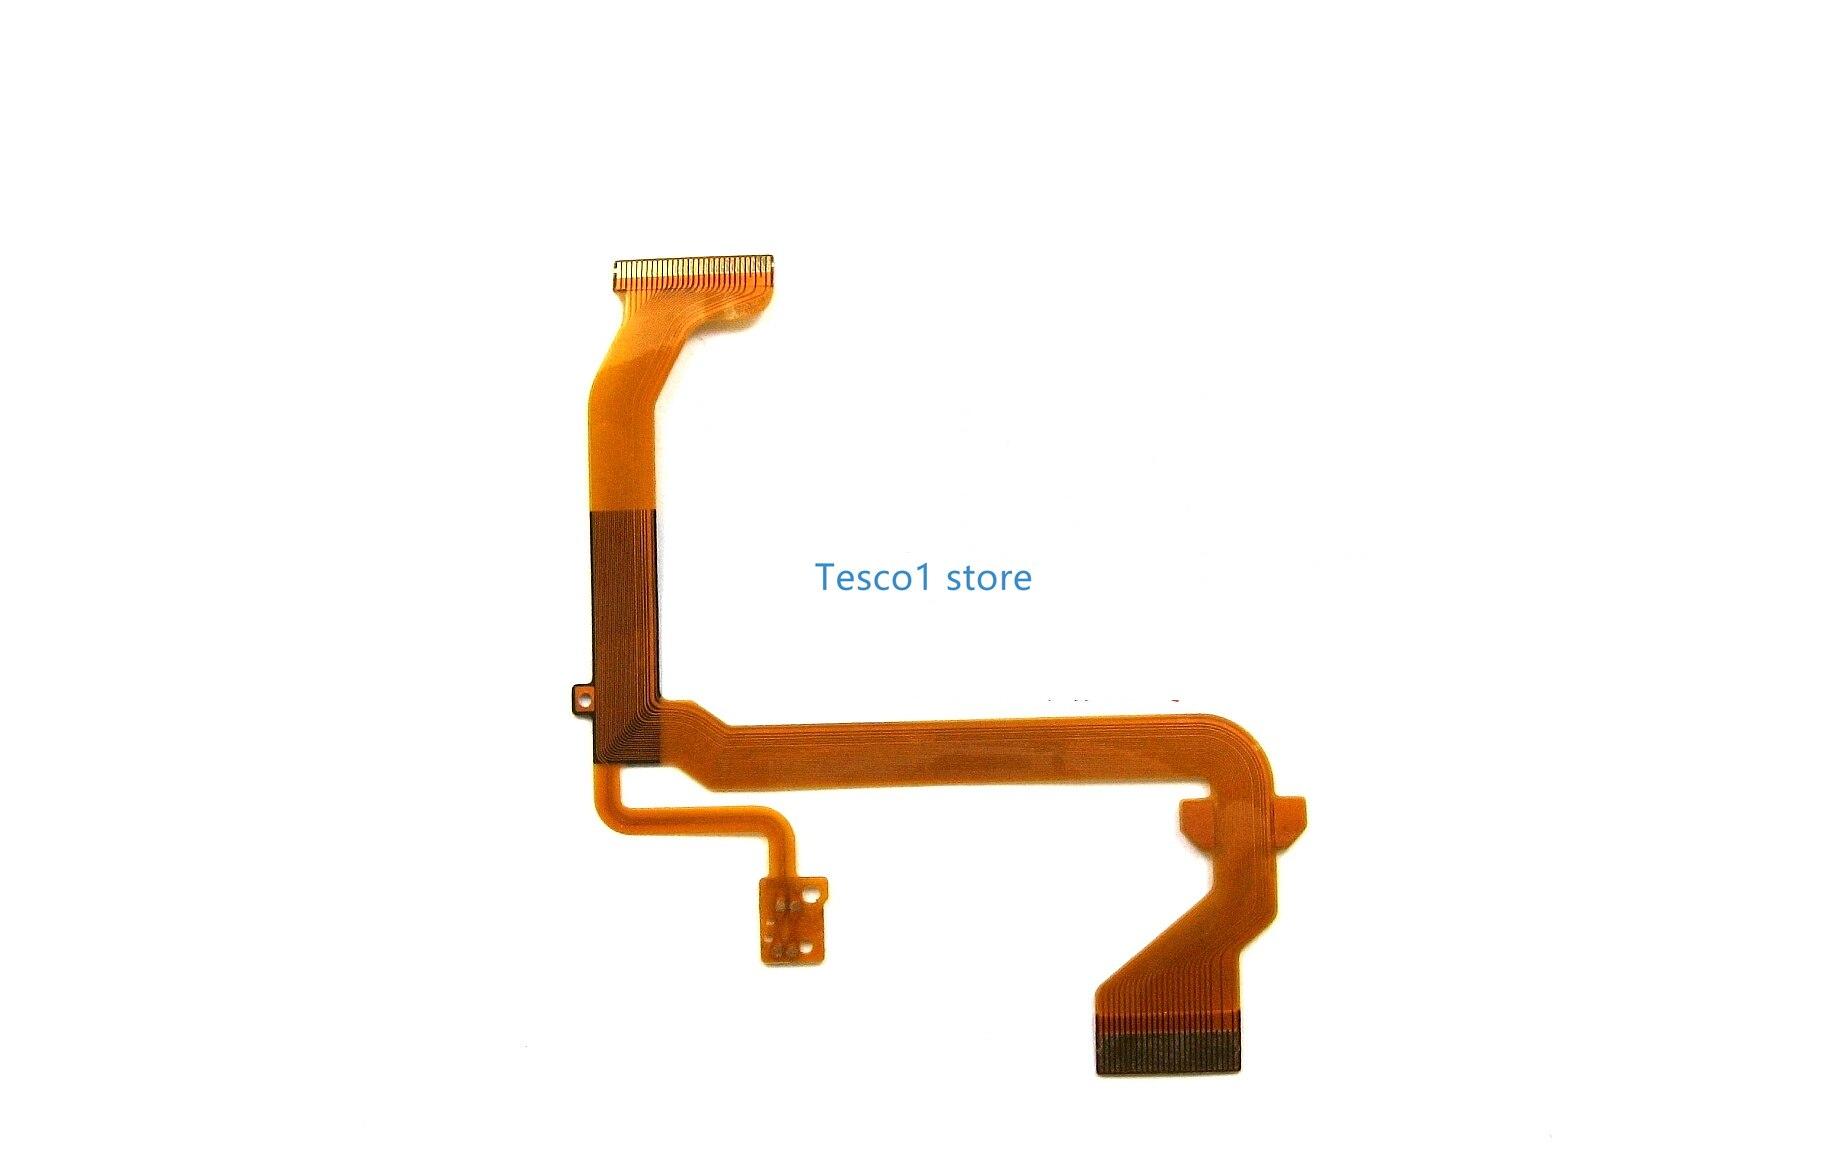 Kabel Flex Flex dla Panasonic NV-GS17 GS19 GS21 GS25 GS28 GS35 GS38 kamery